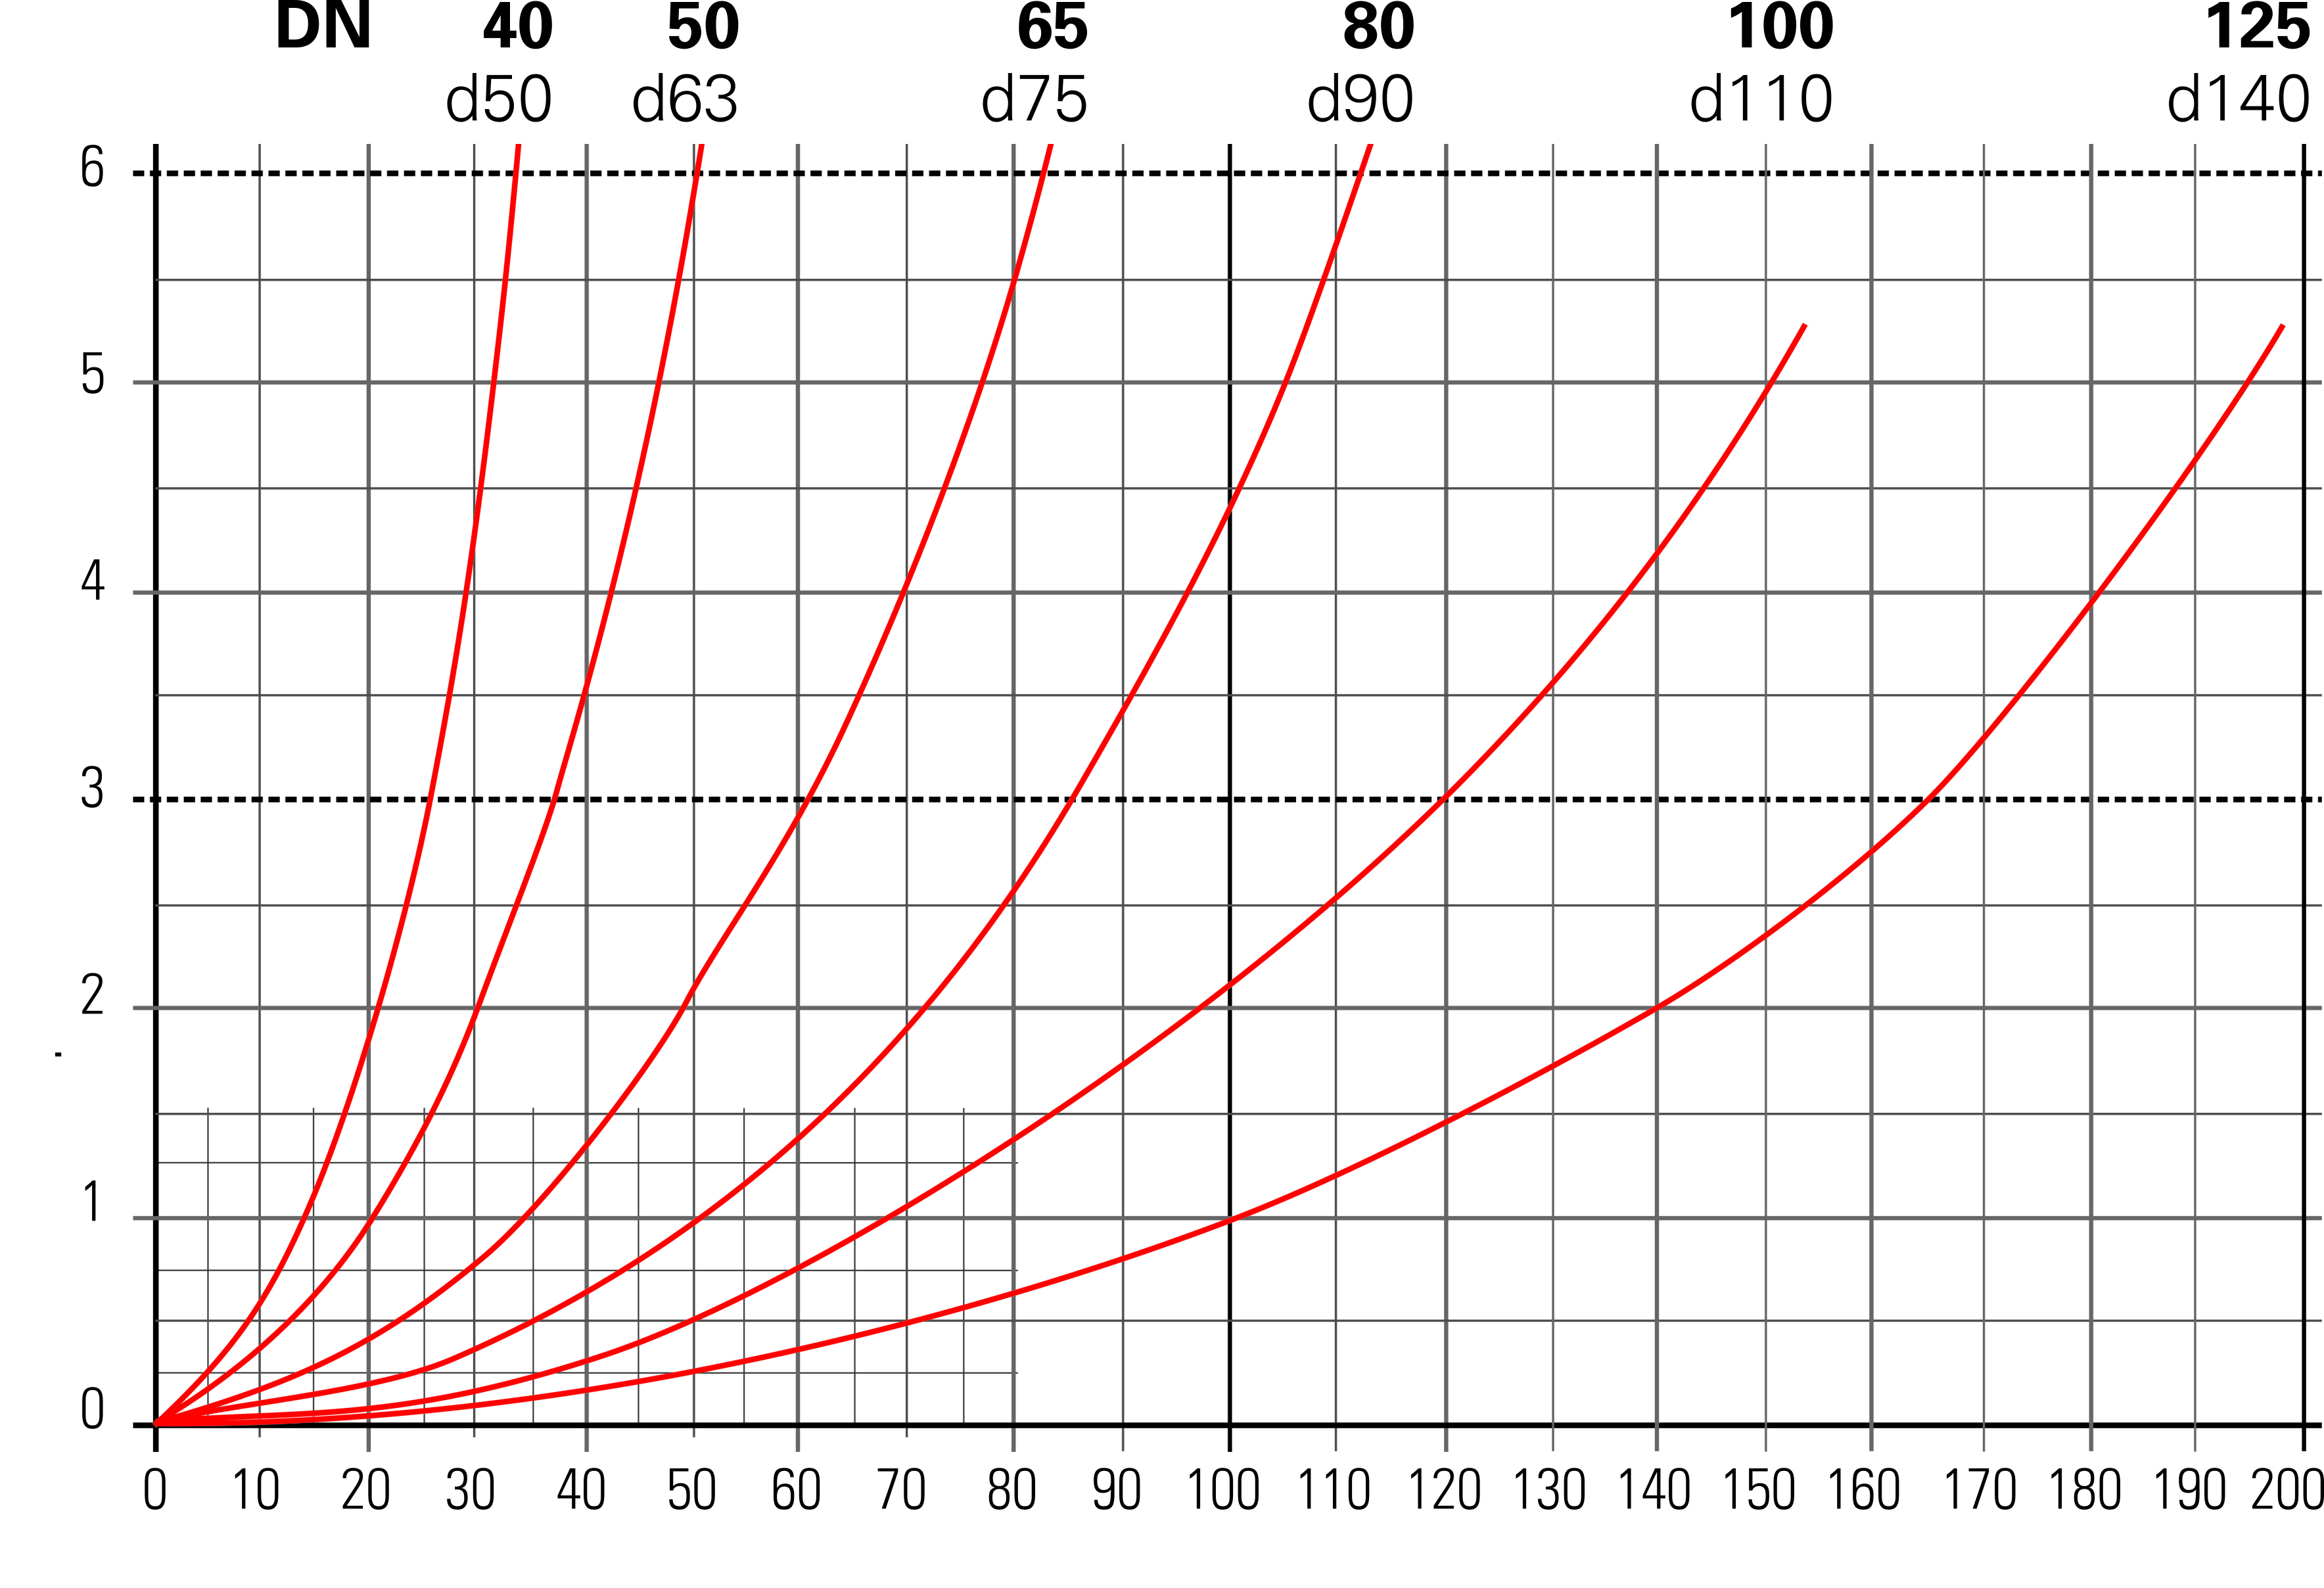 Besgo 3-way valves - Pressure loss data